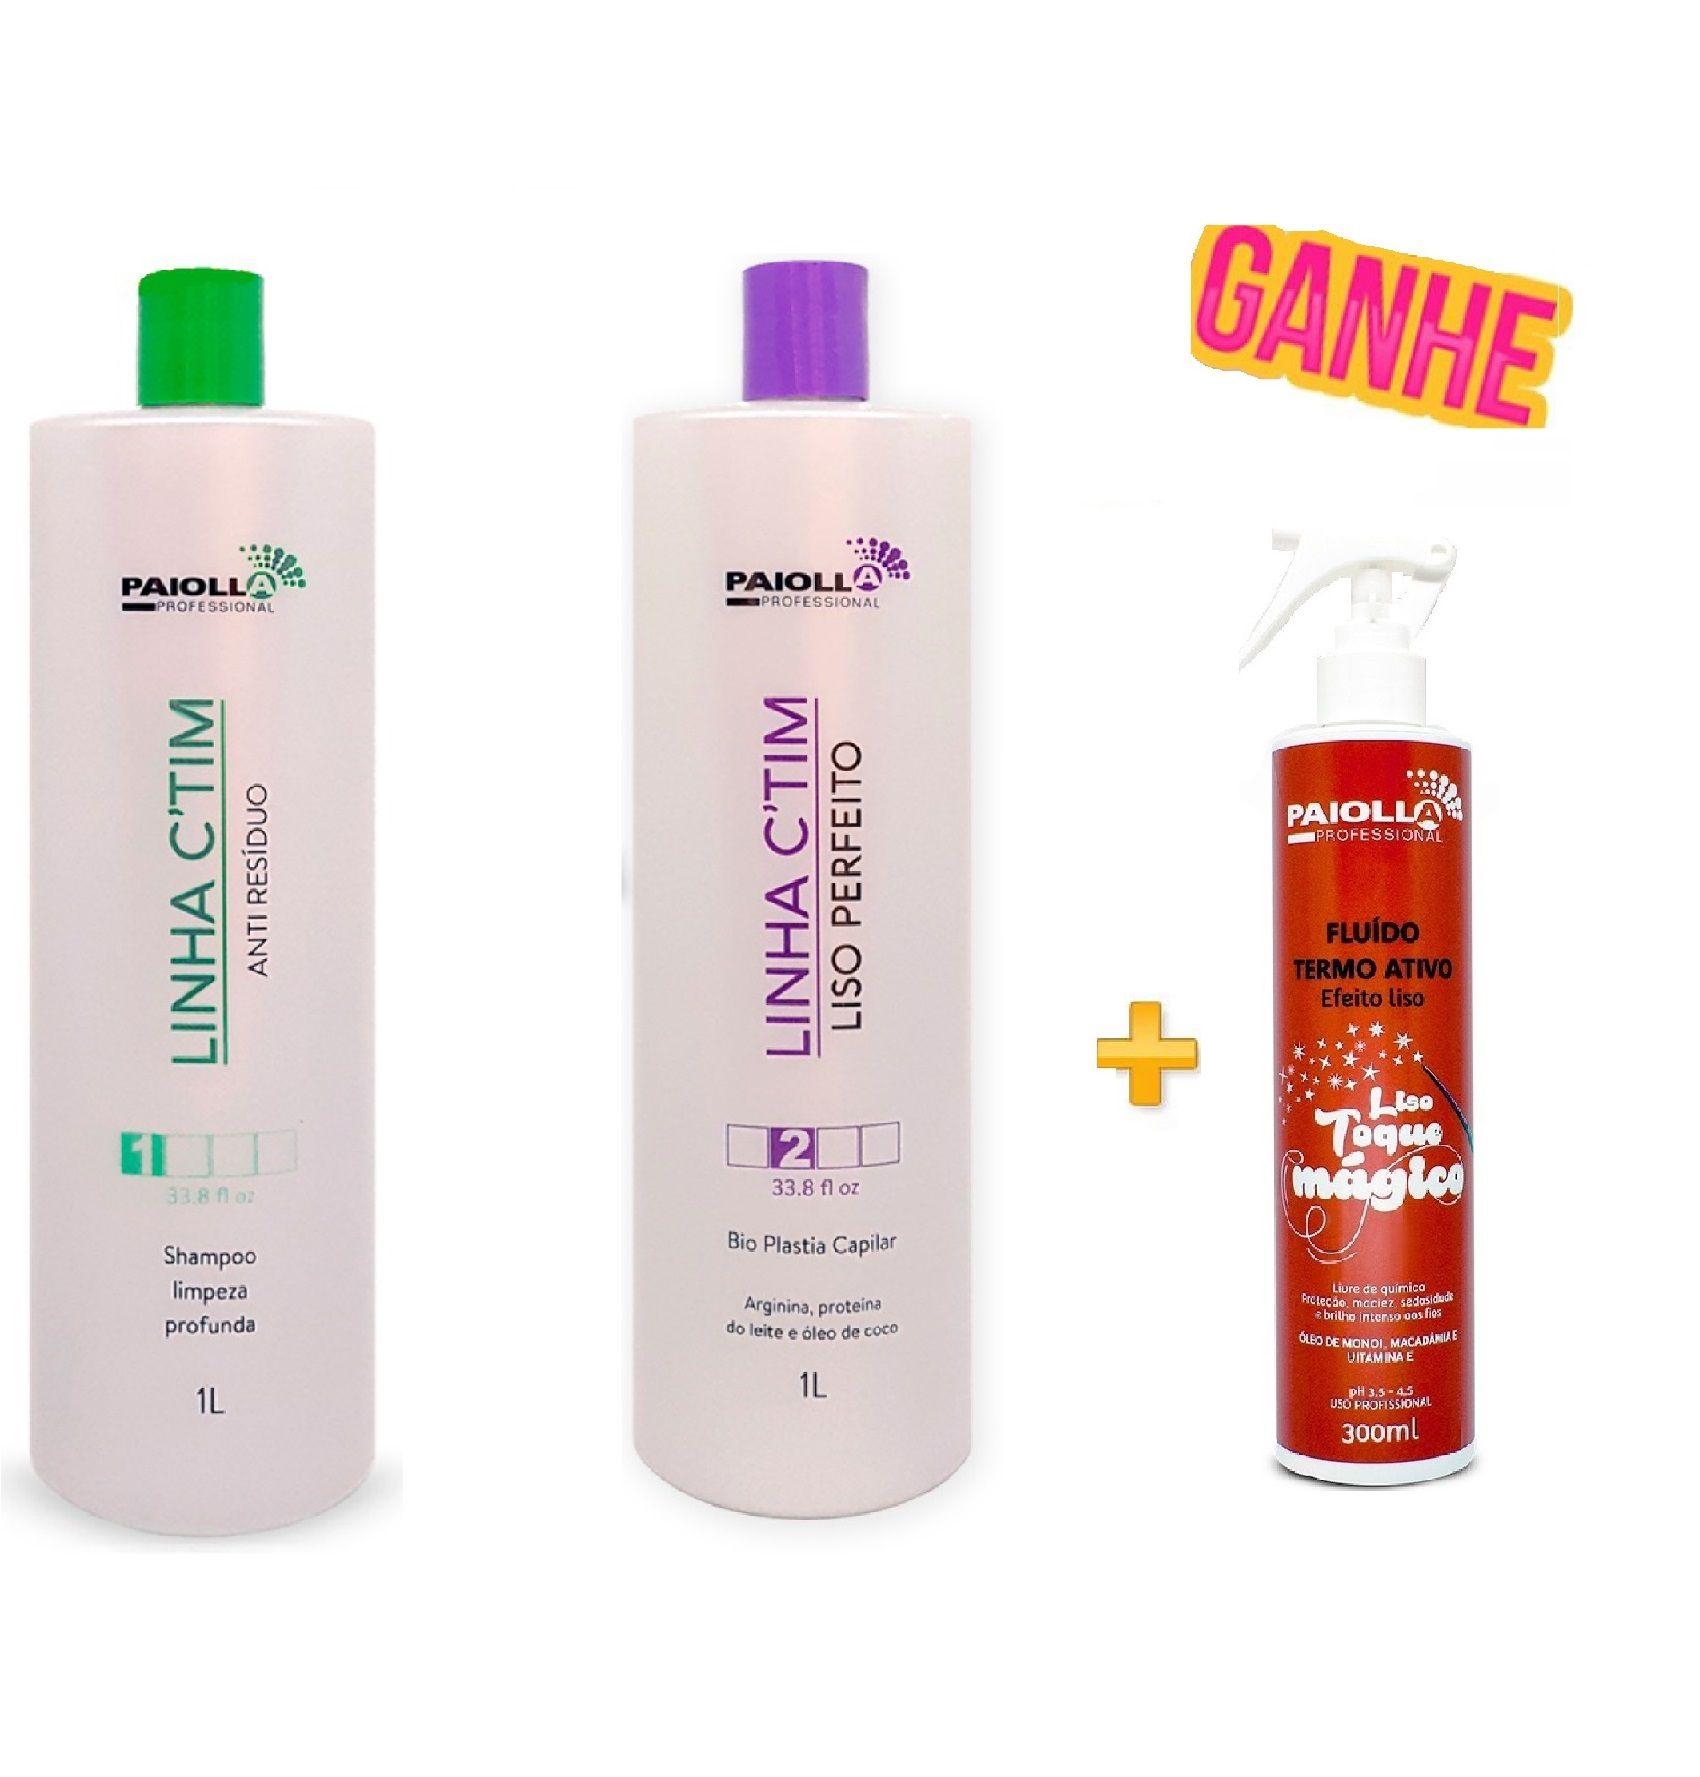 COMBO PROFISSIONAL Escova Progressiva Ctim + Shampoo + Fluído Liso Toque Mágico 300ml